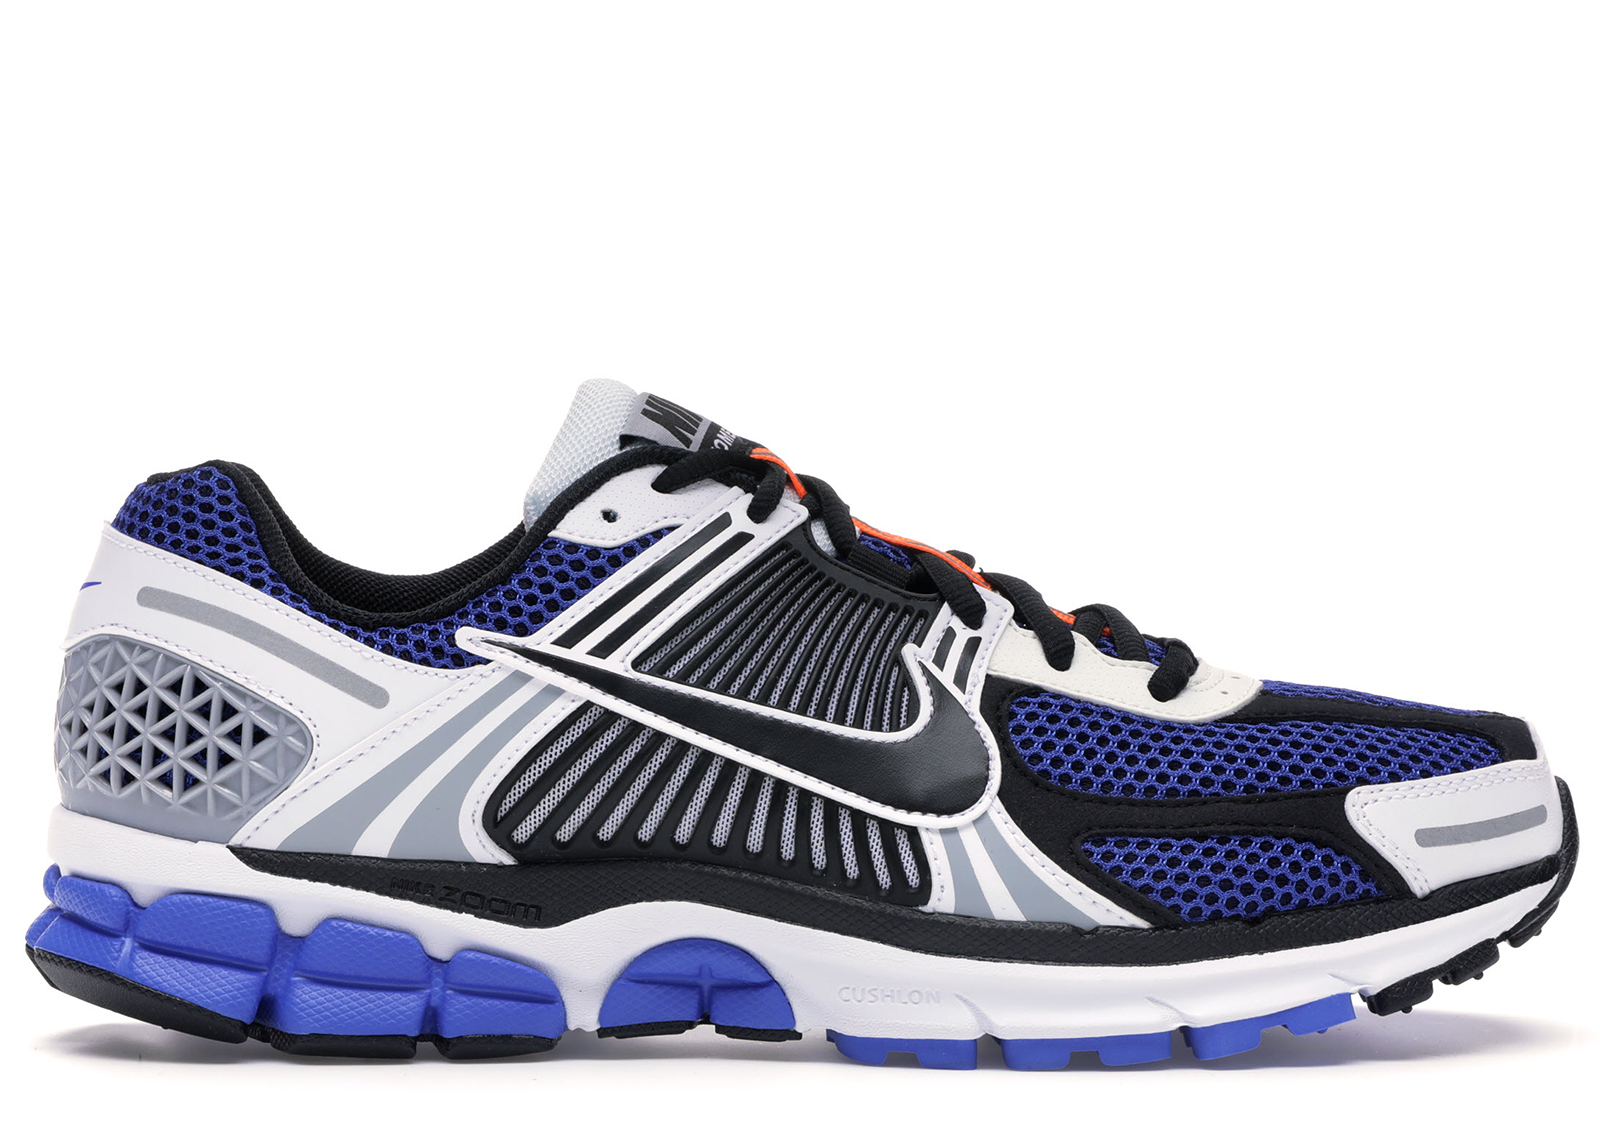 Nike Zoom Vomero 5 White Racer Blue